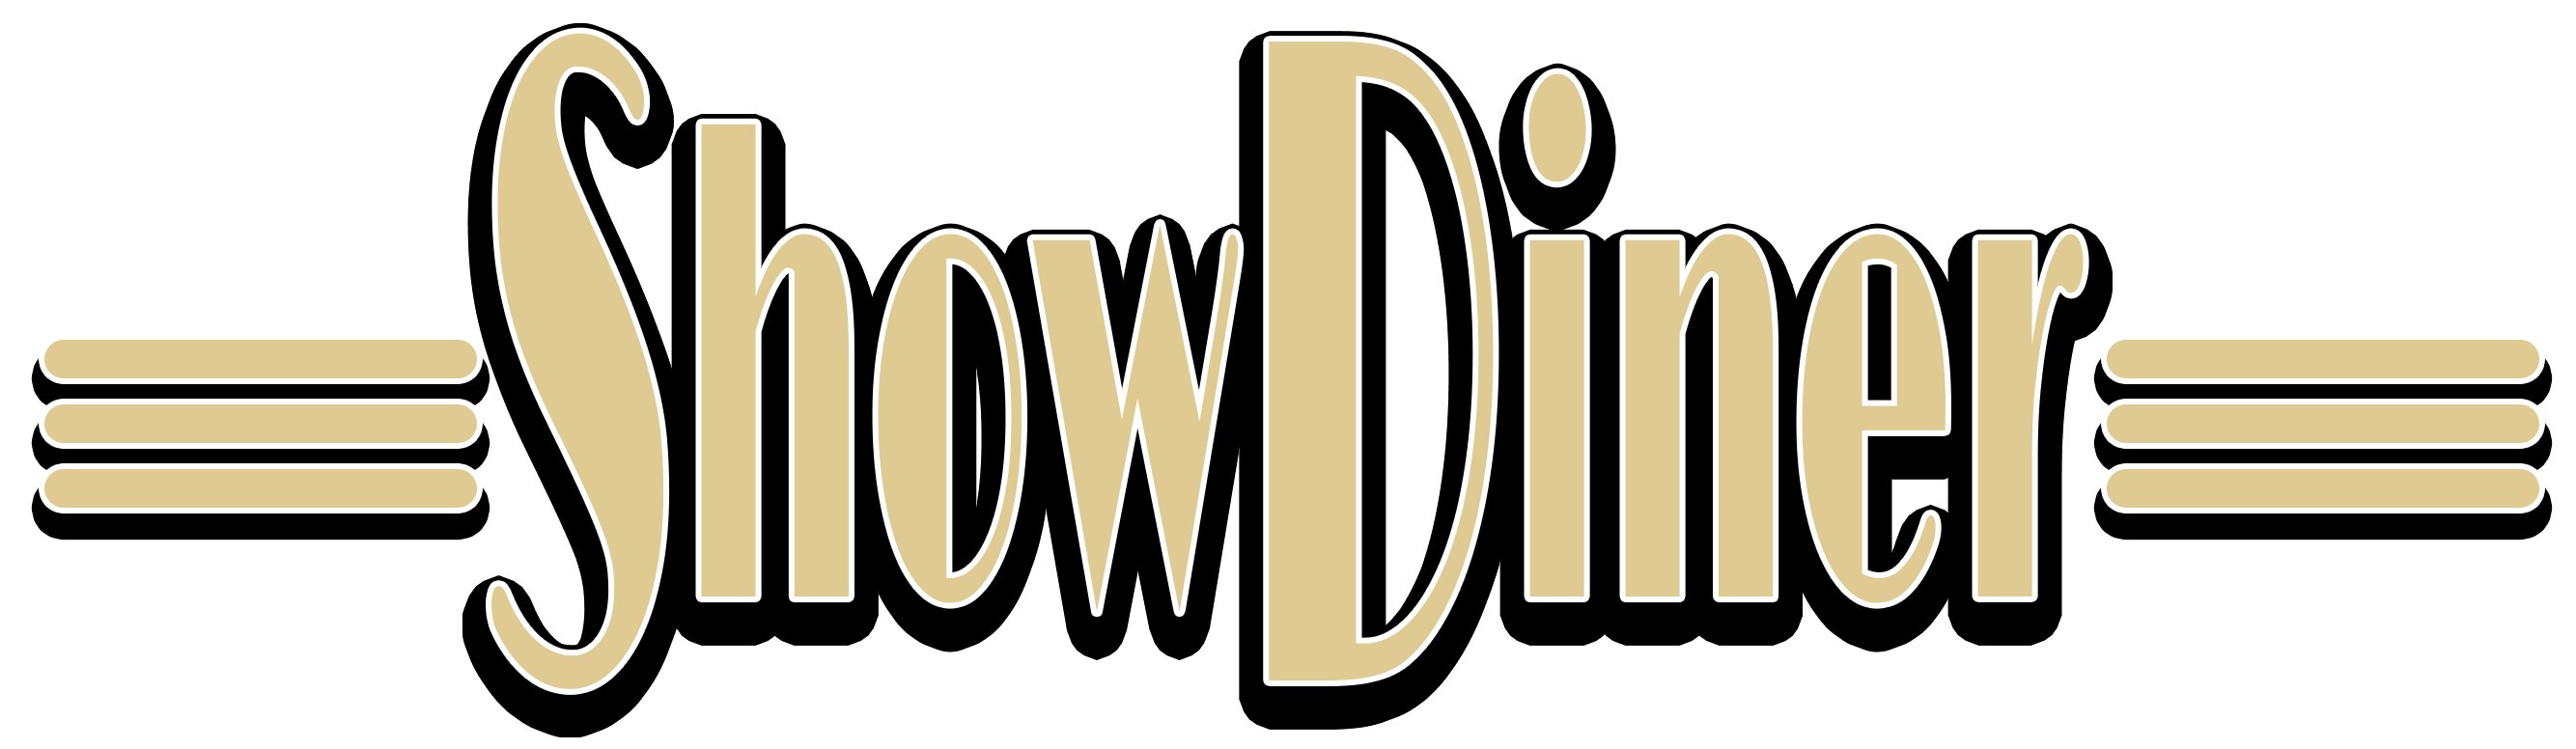 SHOW DINER(ショーダイナー)ダンスショーを楽しめる常設スペースin秋葉原